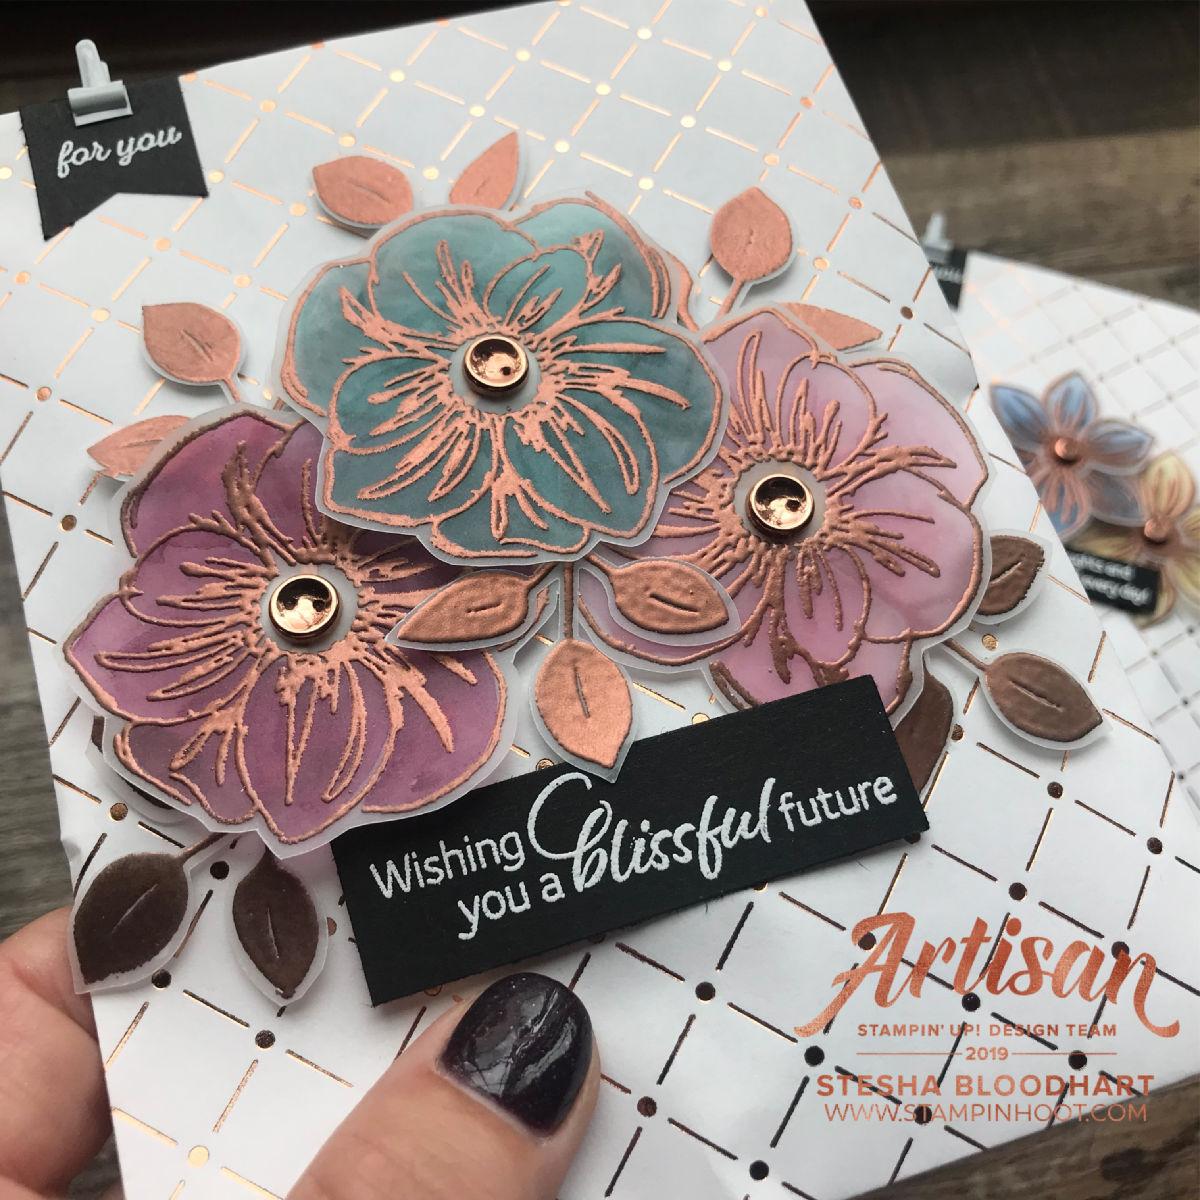 Floral Essence Stamp Set & Copper Dotted Treat Bags July 2019 Artisan Blog Hop Stesha Bloodhart